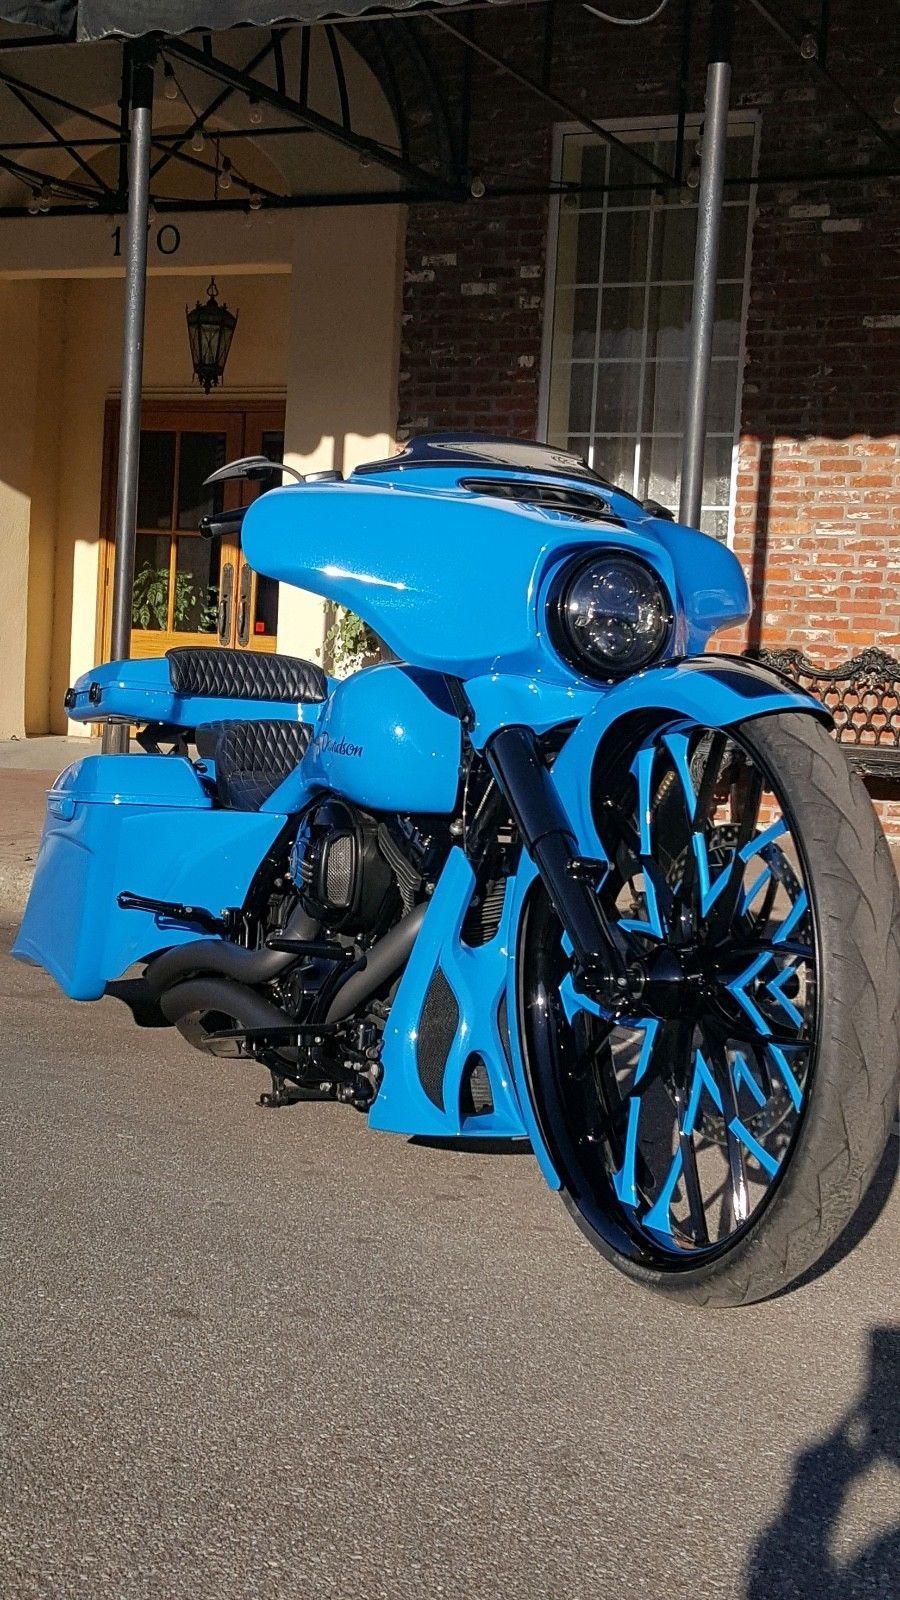 Ebay Motors Motorcycles >> Details About 2014 Harley Davidson Touring Harley Davidson